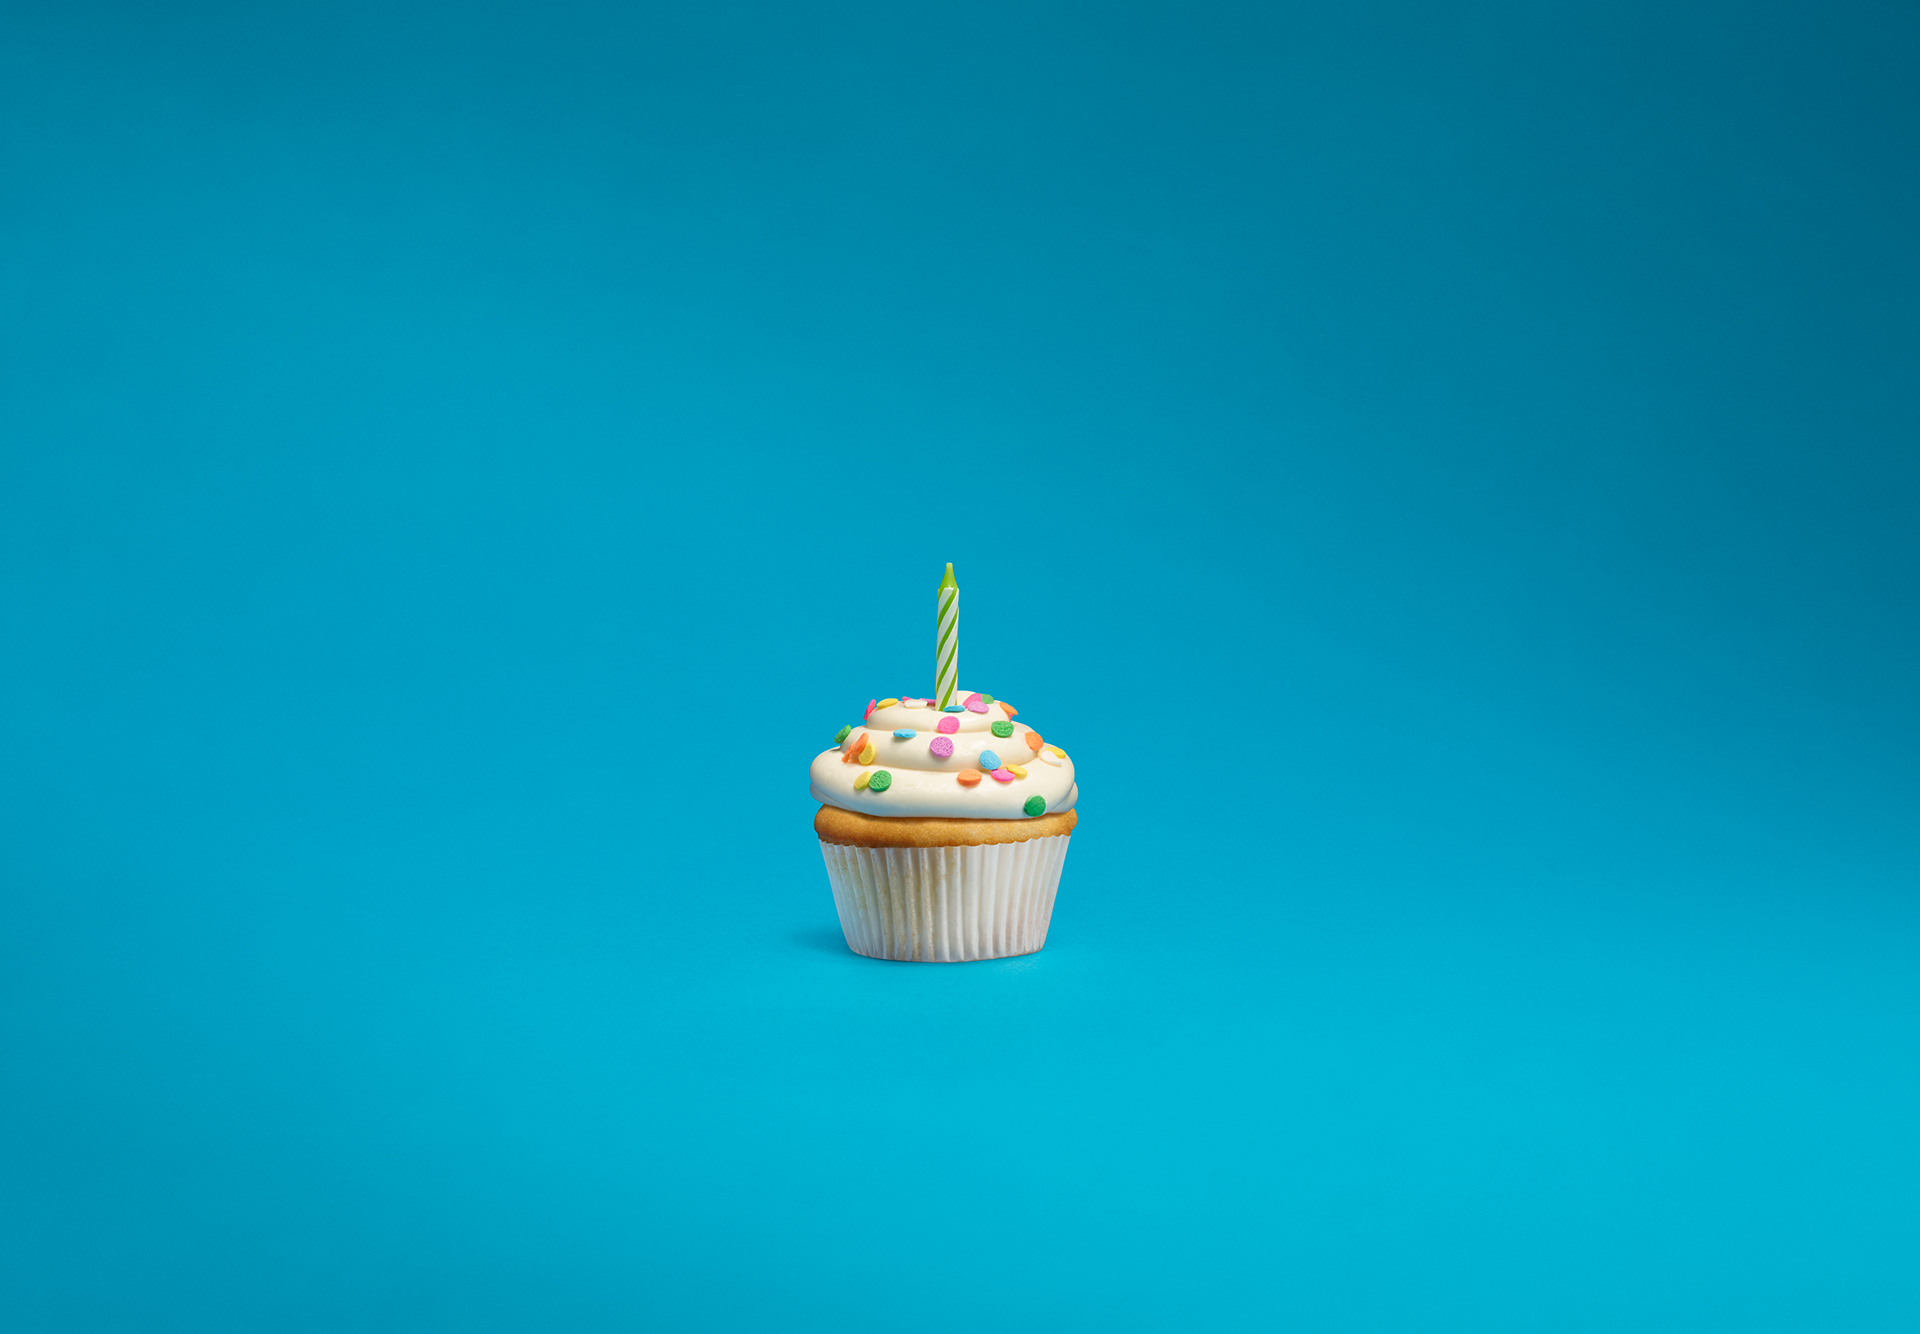 Android Cupcake Minimalism, HD Computer, 4k Wallpapers